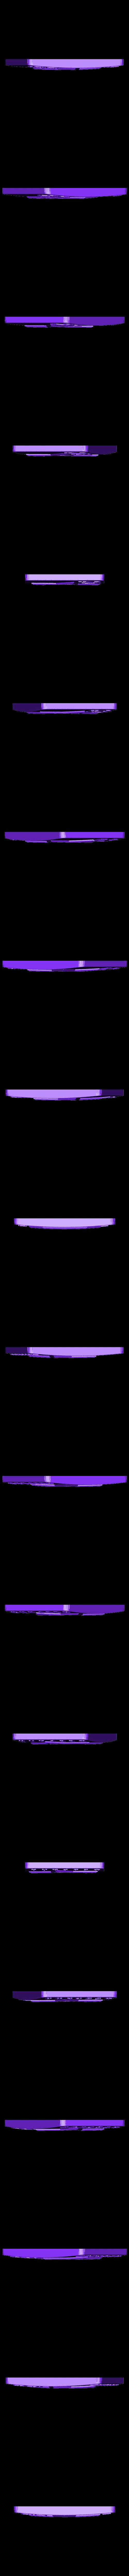 BLAHA1.stl Download free STL file Солдатские бляхи на 23 февраля (belt buckle) • Model to 3D print, shuranikishin